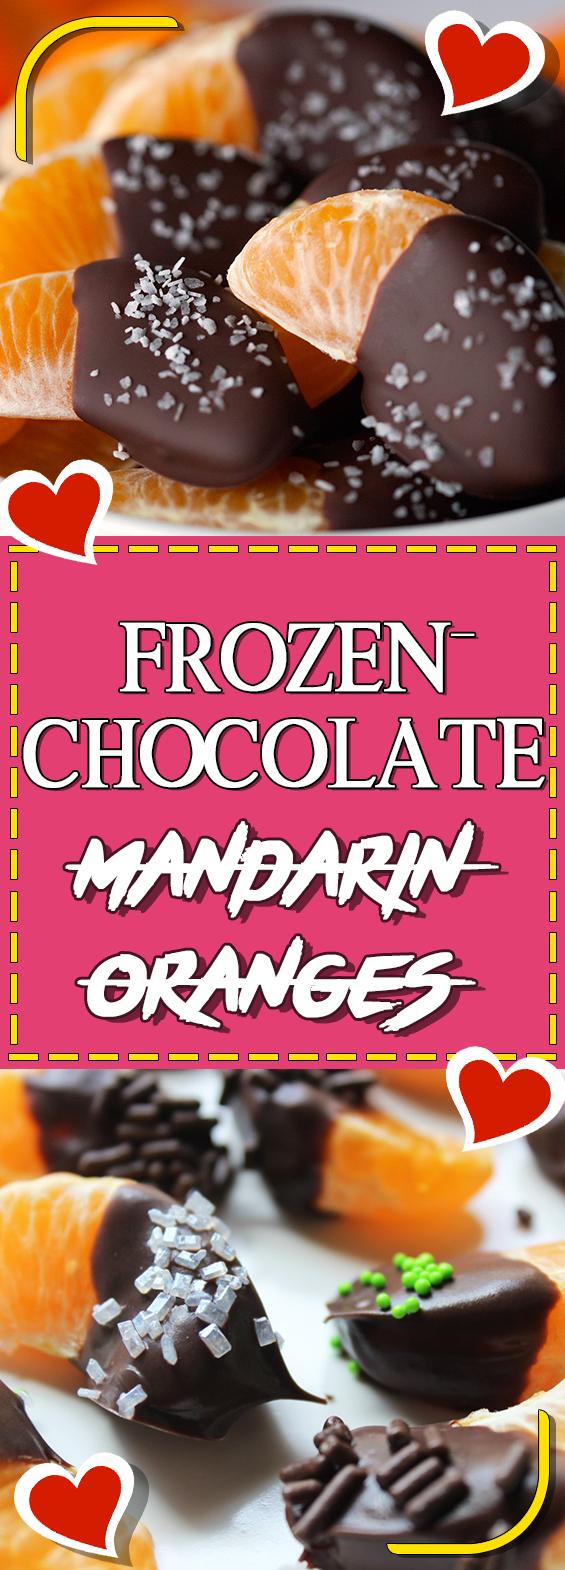 Beautiful FROZEN CHOCOLATE MANDARIN ORANGES #dessert Dessert Ideas #cookinglight  Cooking Light Recipes #sundaysupper Sunday Pictures